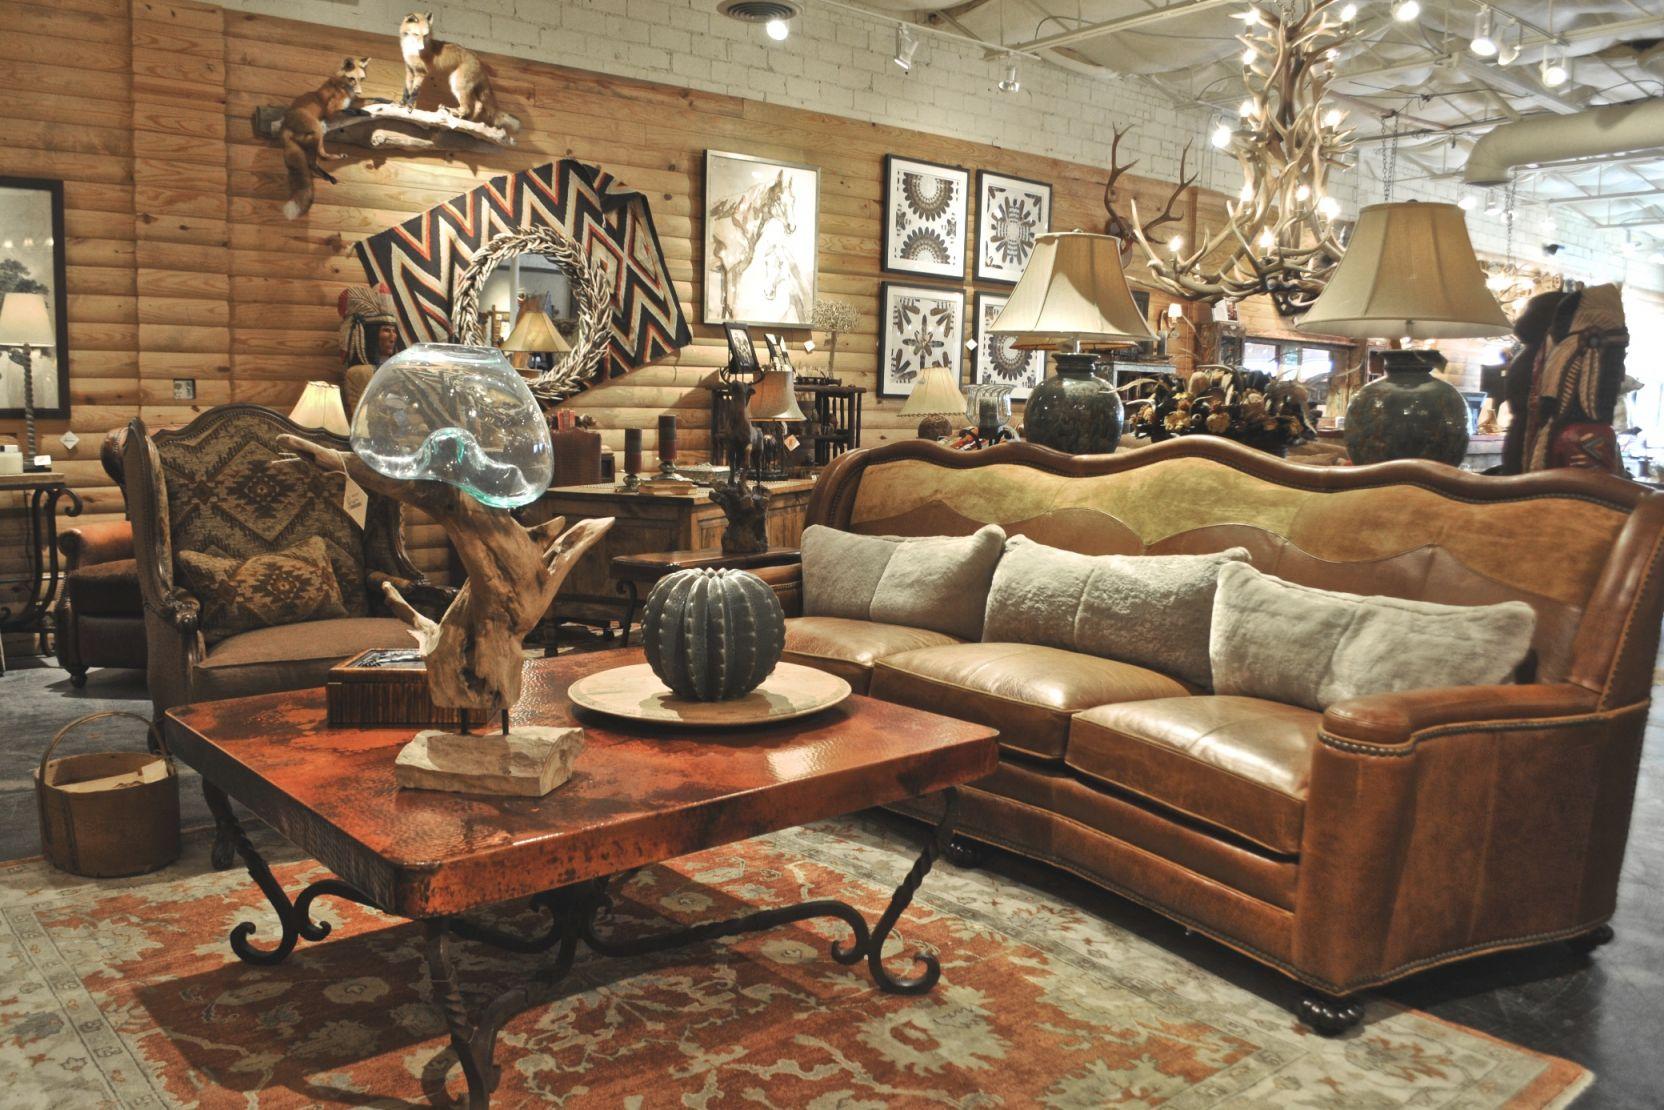 Rustic Living Room Furniture At Anteks Furniture In Dallas for Inspirational Rustic Living Room Furniture